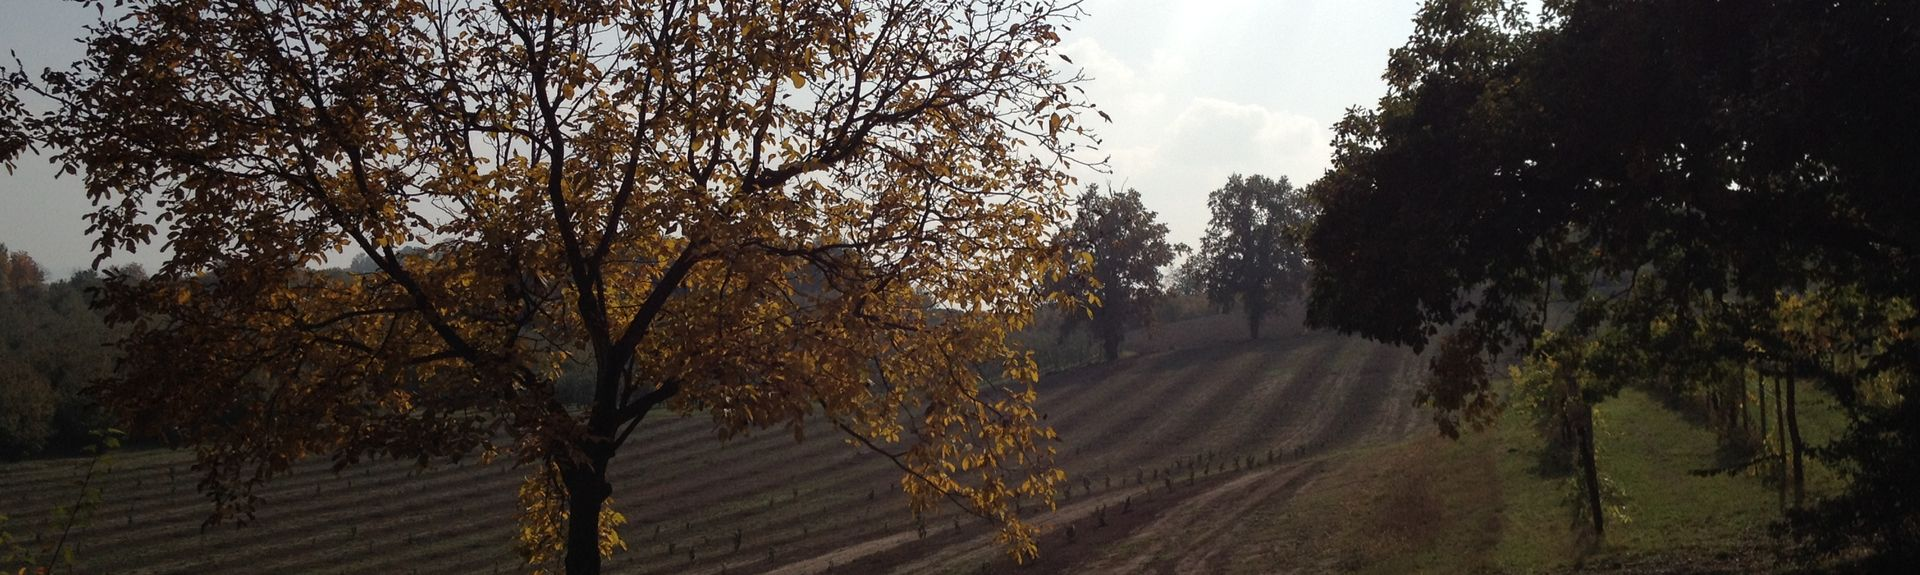 Neive, Piedmont, Italien